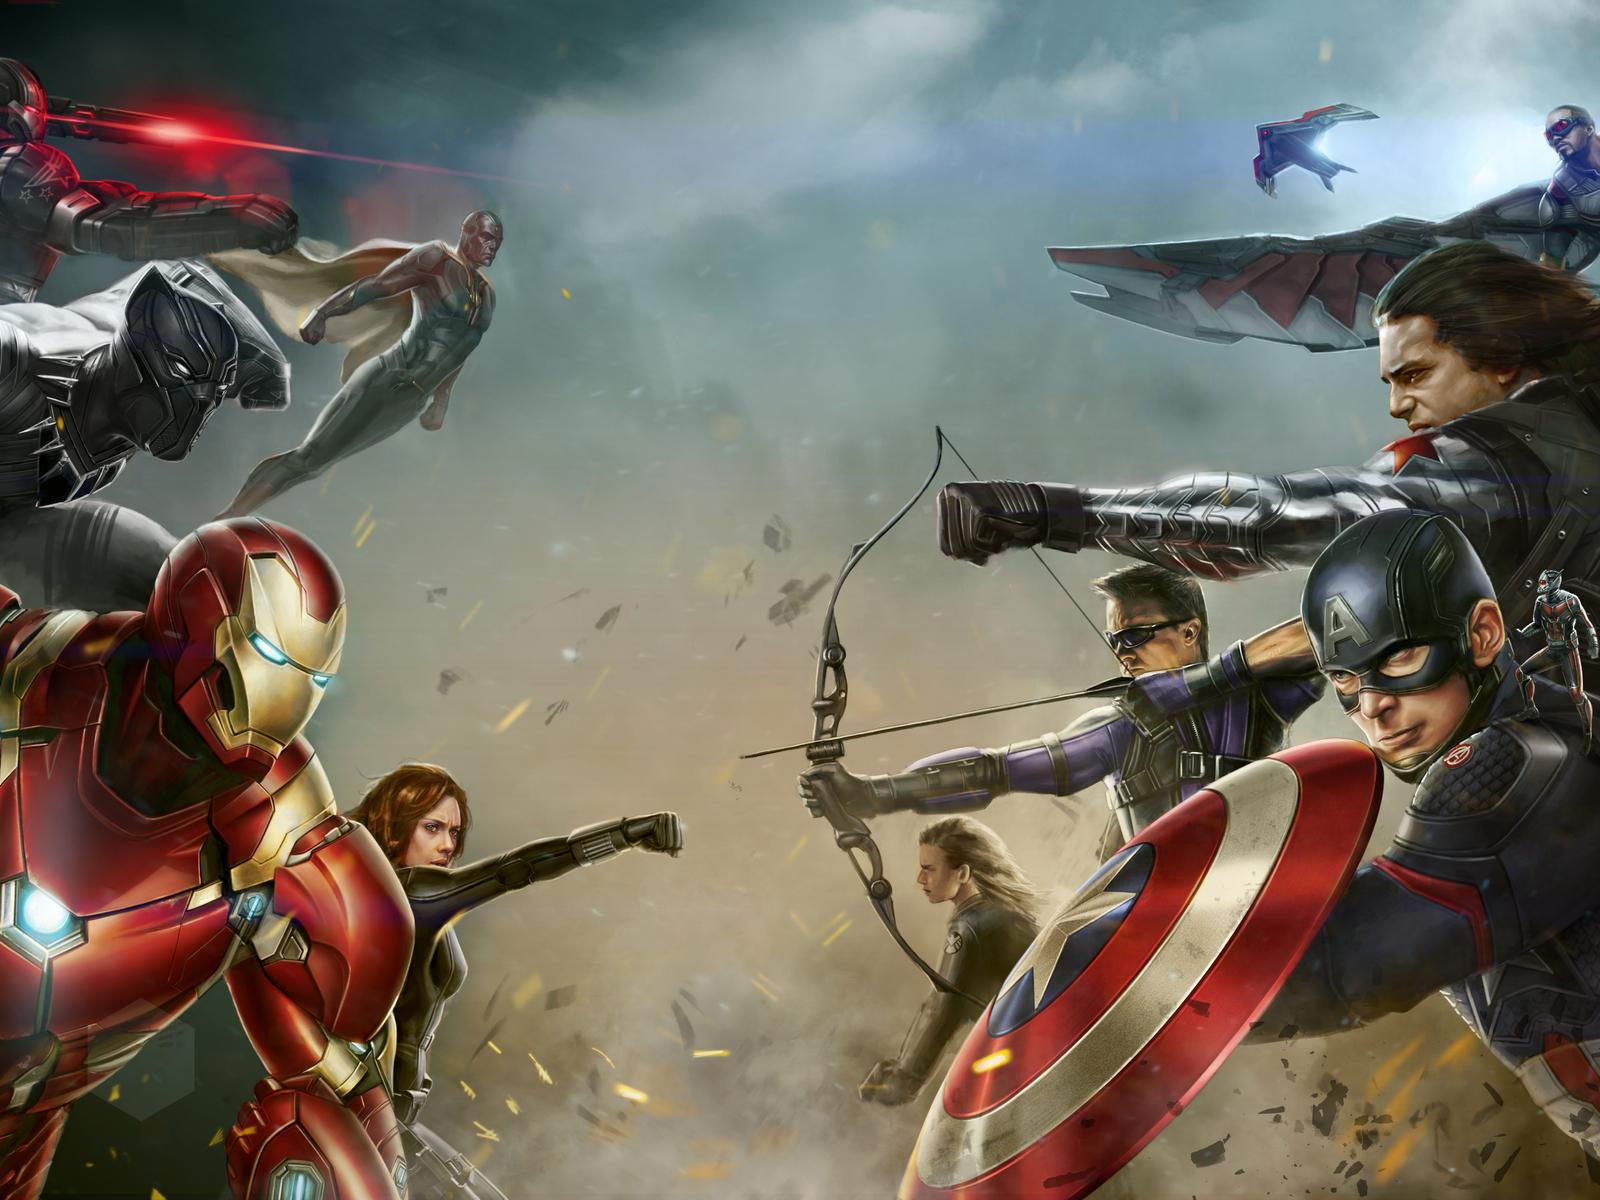 marvel-superhero-8k-digital-art-fd.jpg